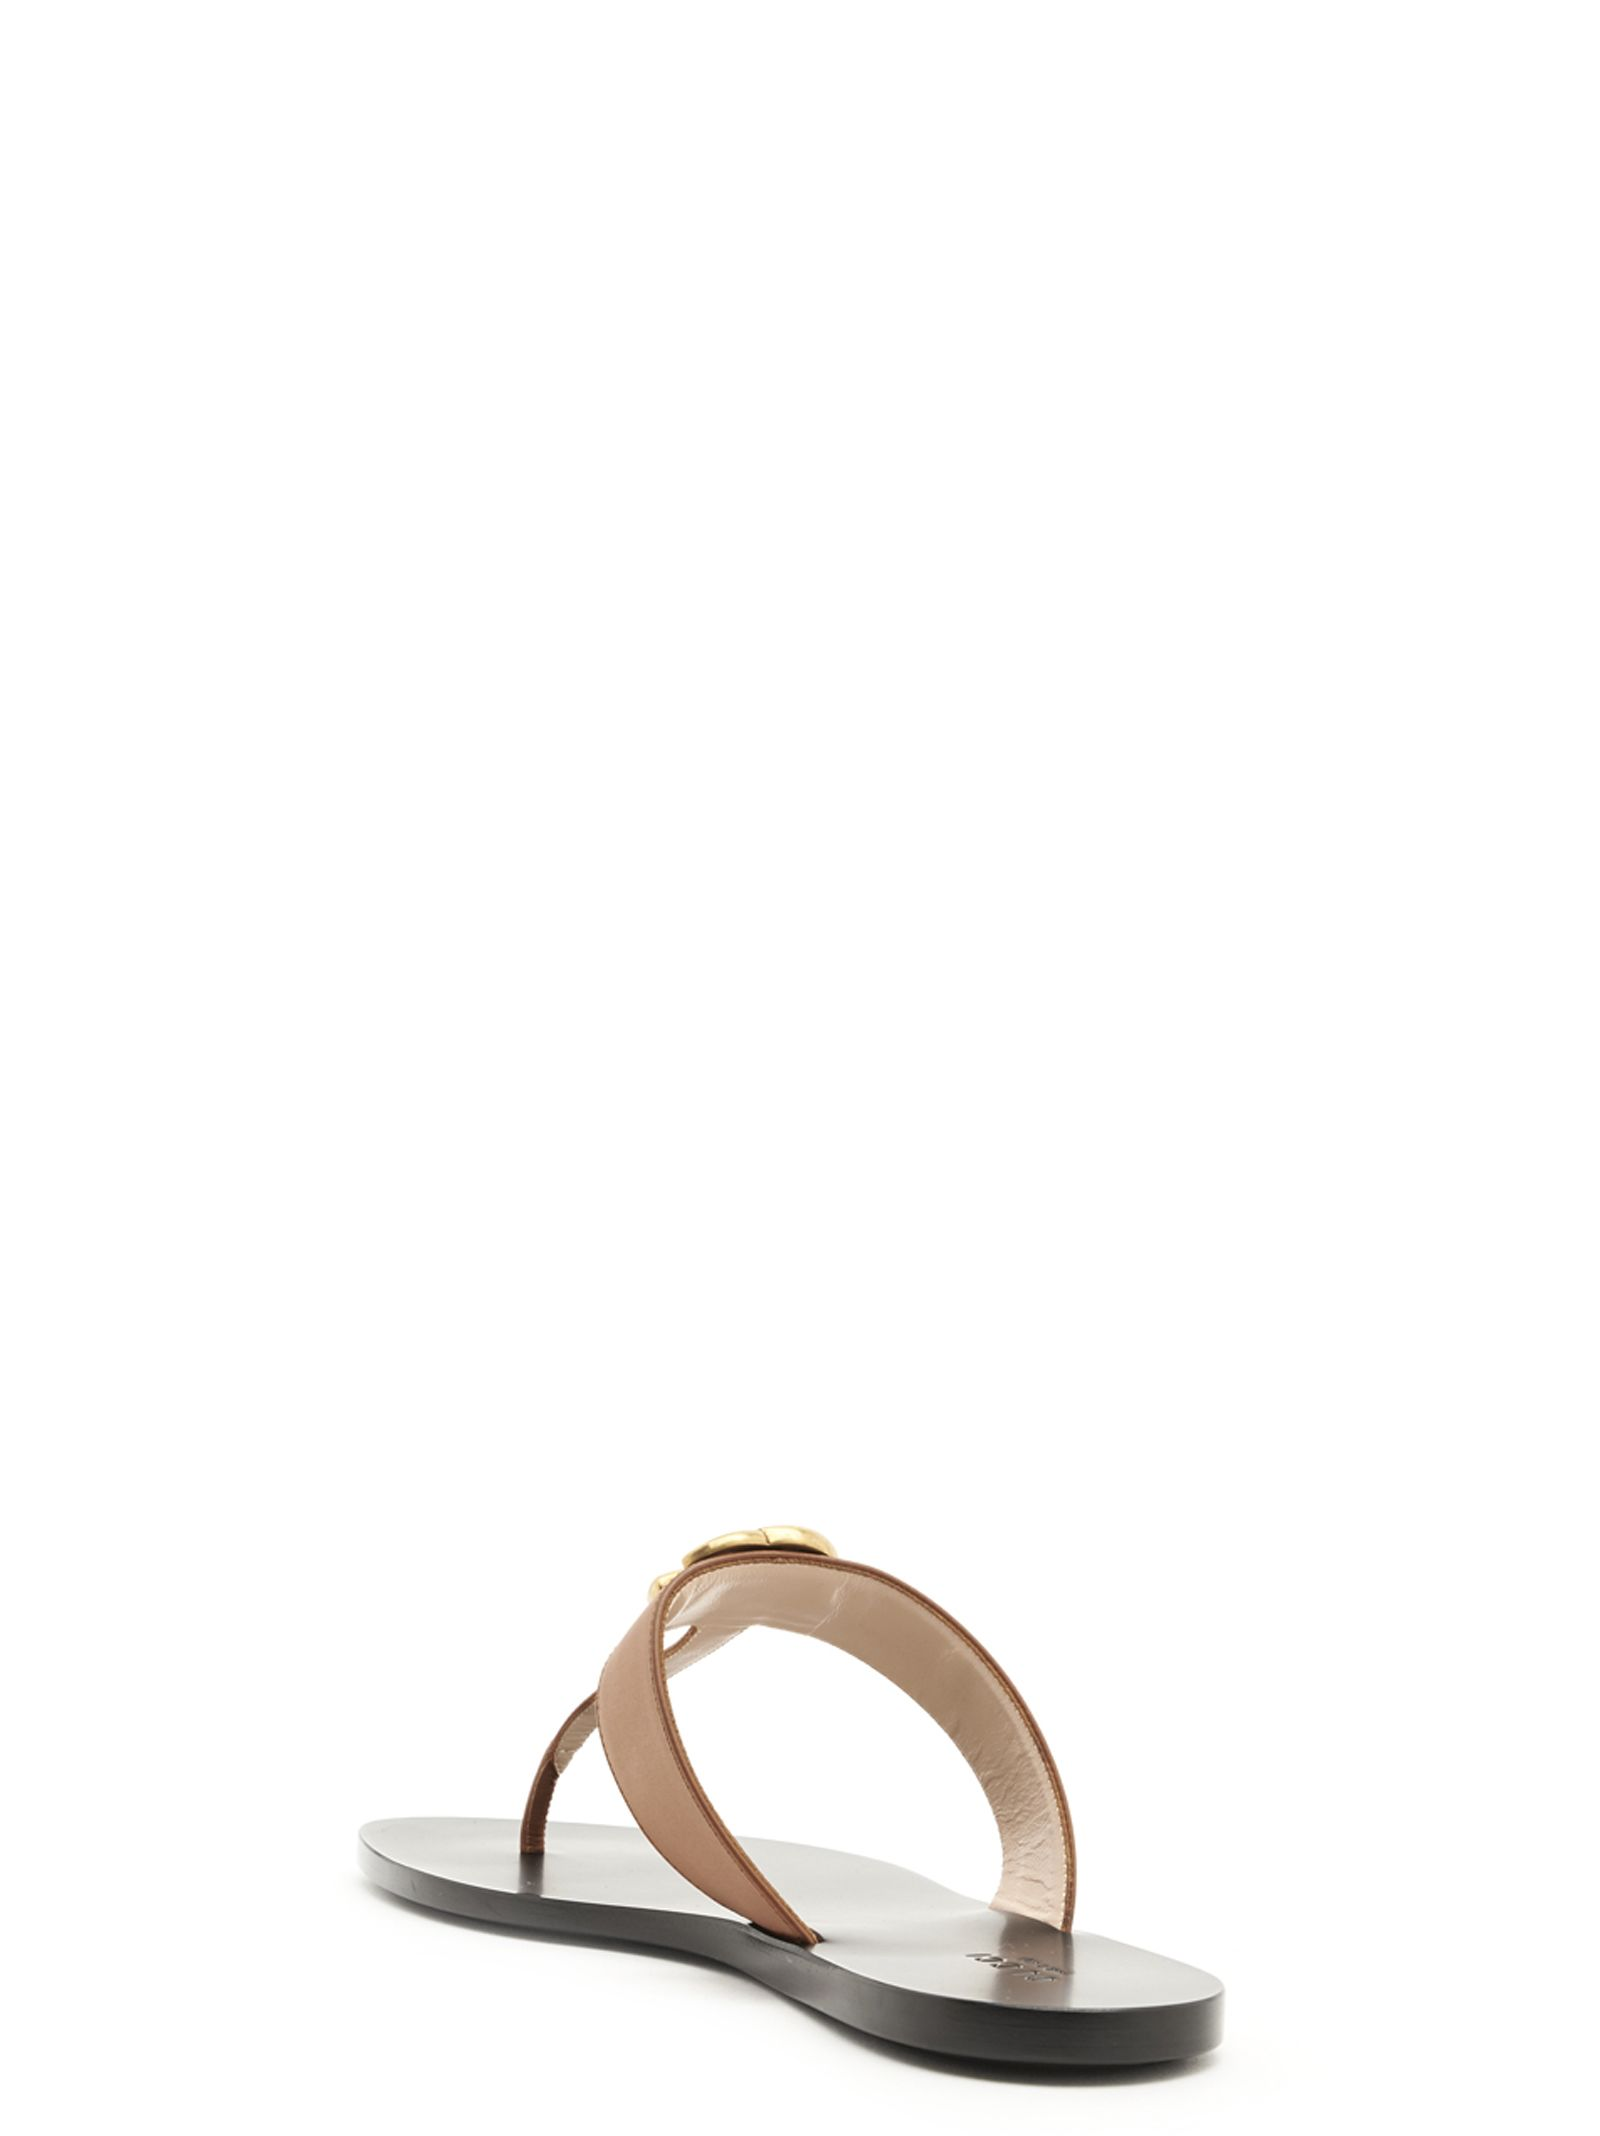 2b702feeb46 Gucci Gucci  marmont  Shoes - Brown - 10828877